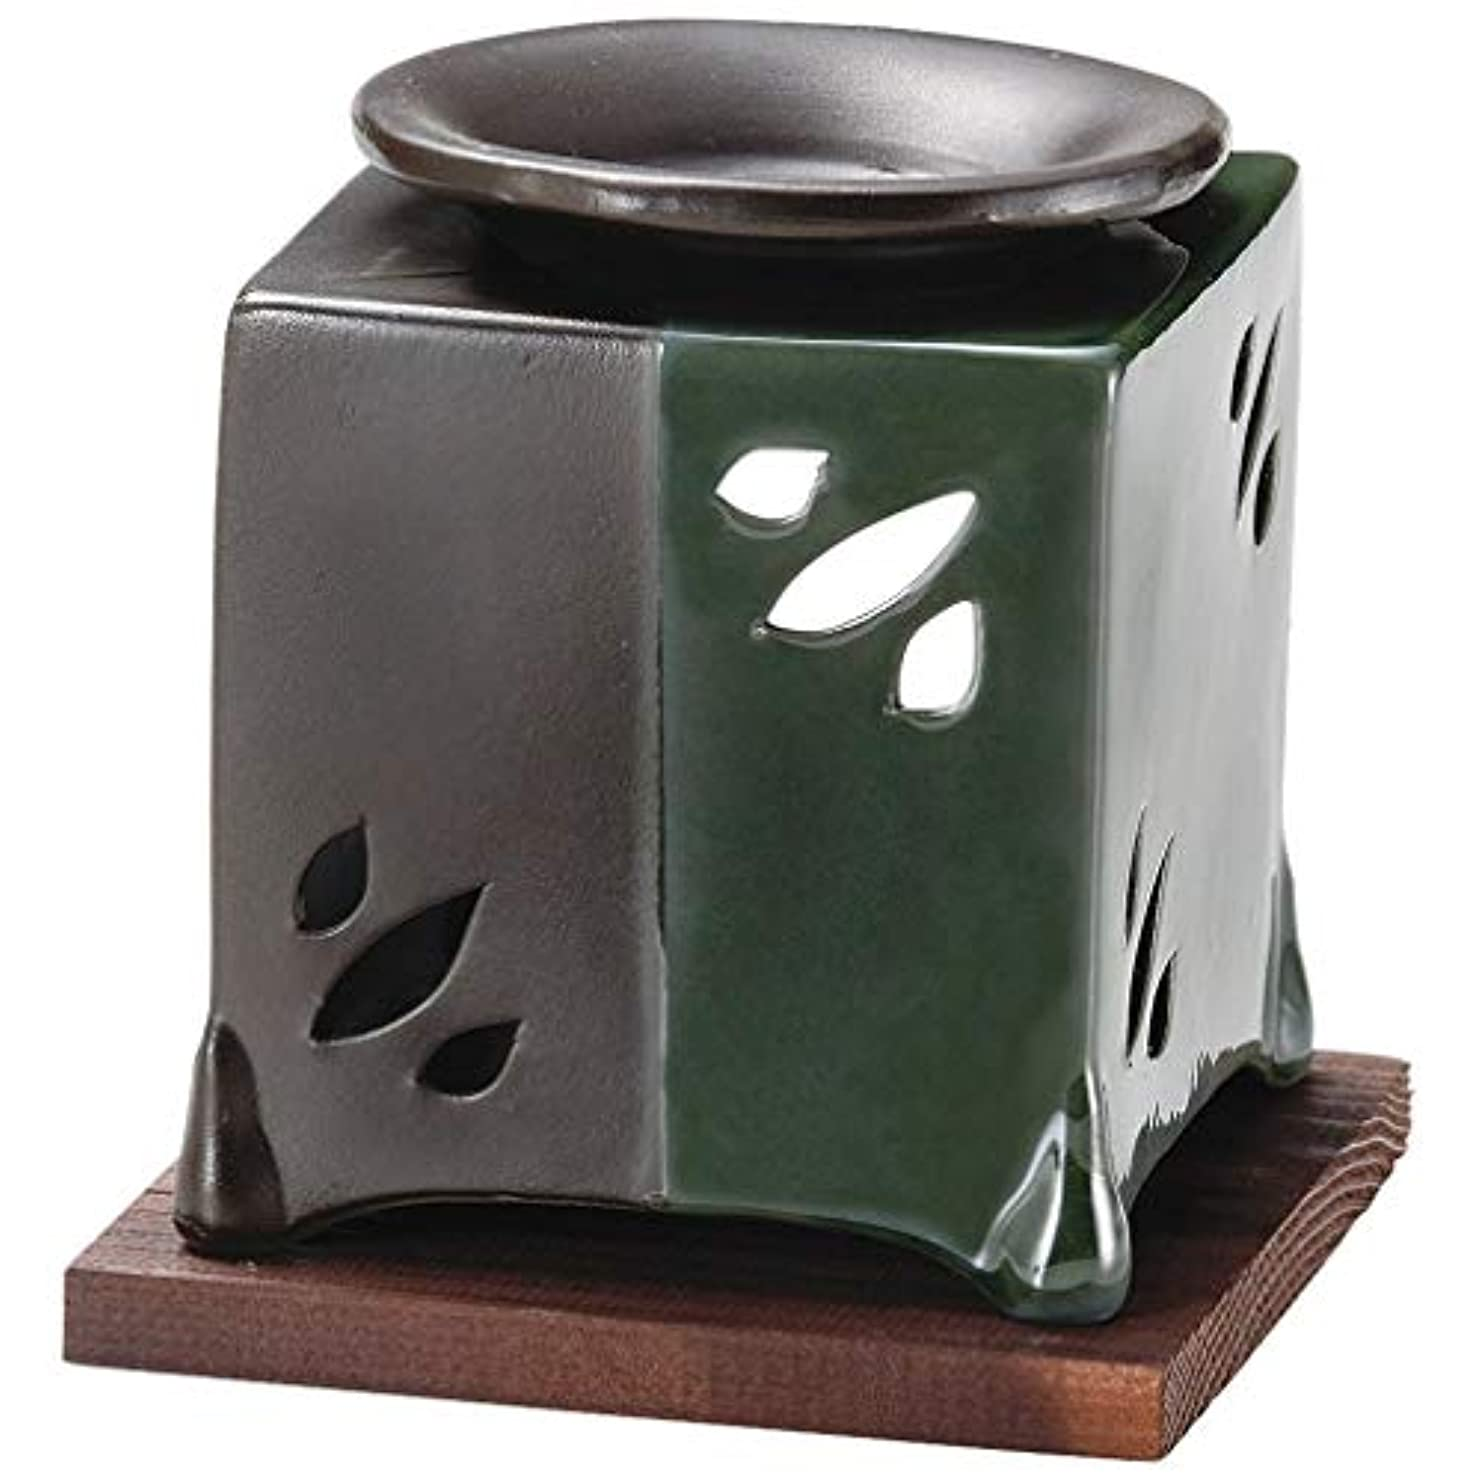 検出する段階資本主義常滑焼 G1711 茶香炉  9×9×11cm